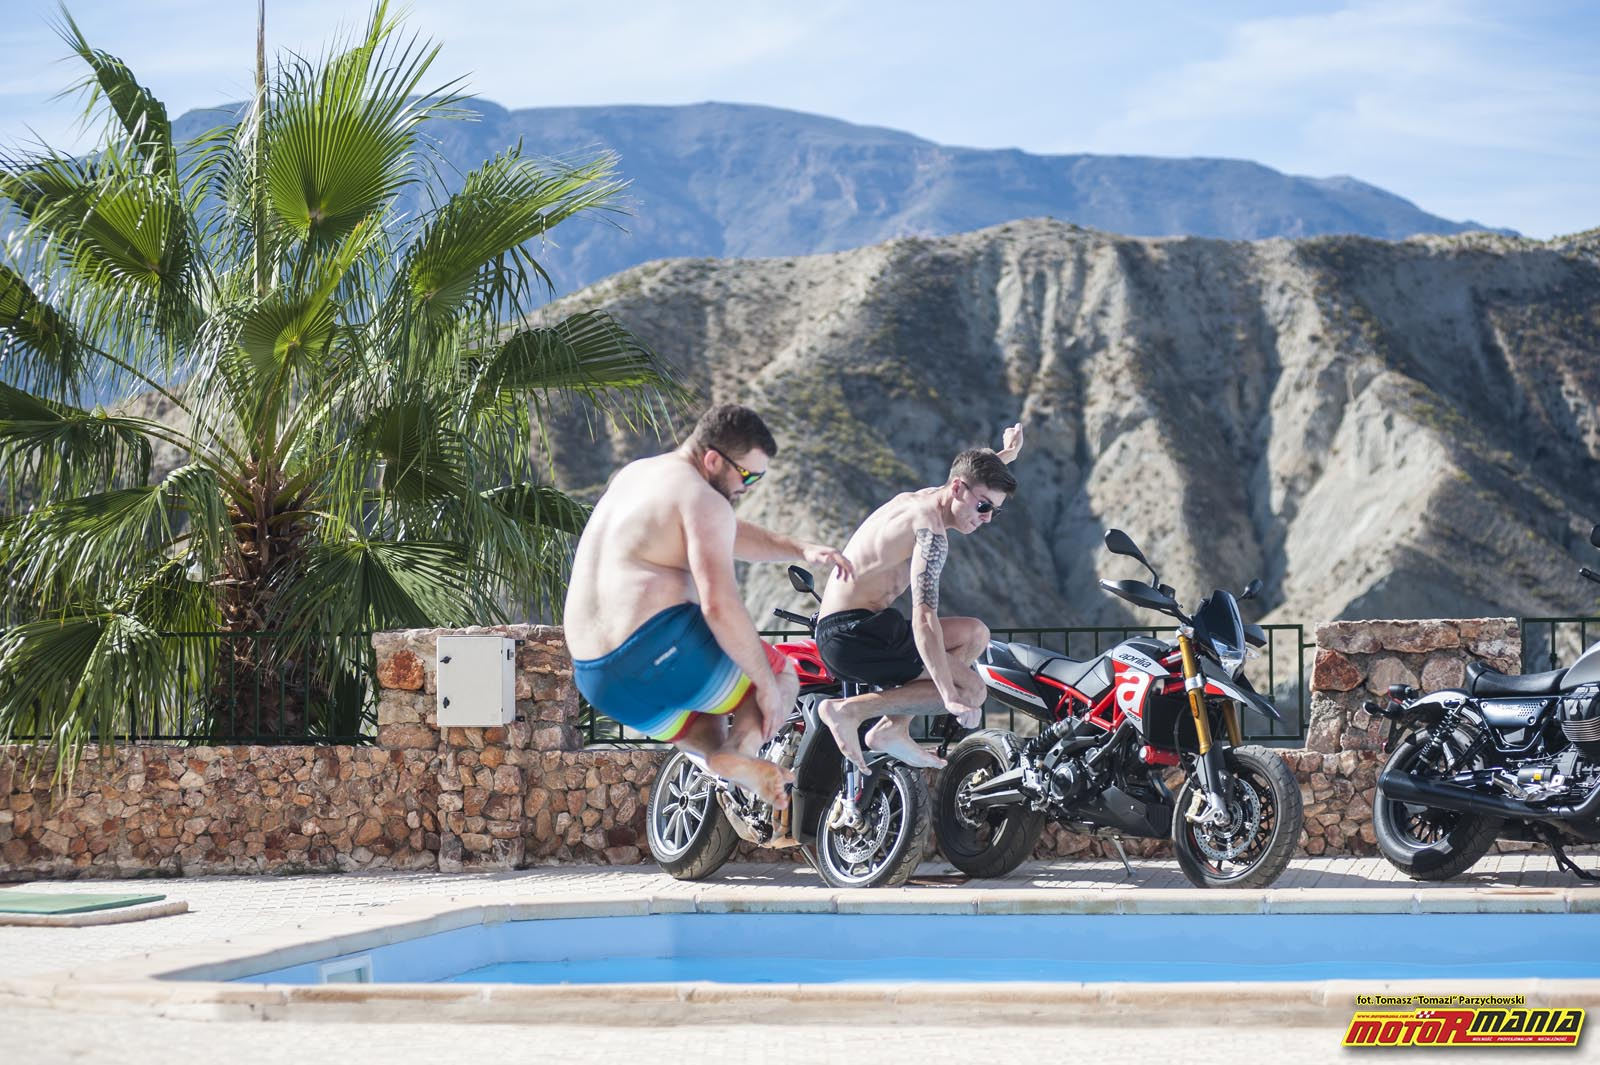 No to hop! Czekamy pod listy@motormania.com.pl !